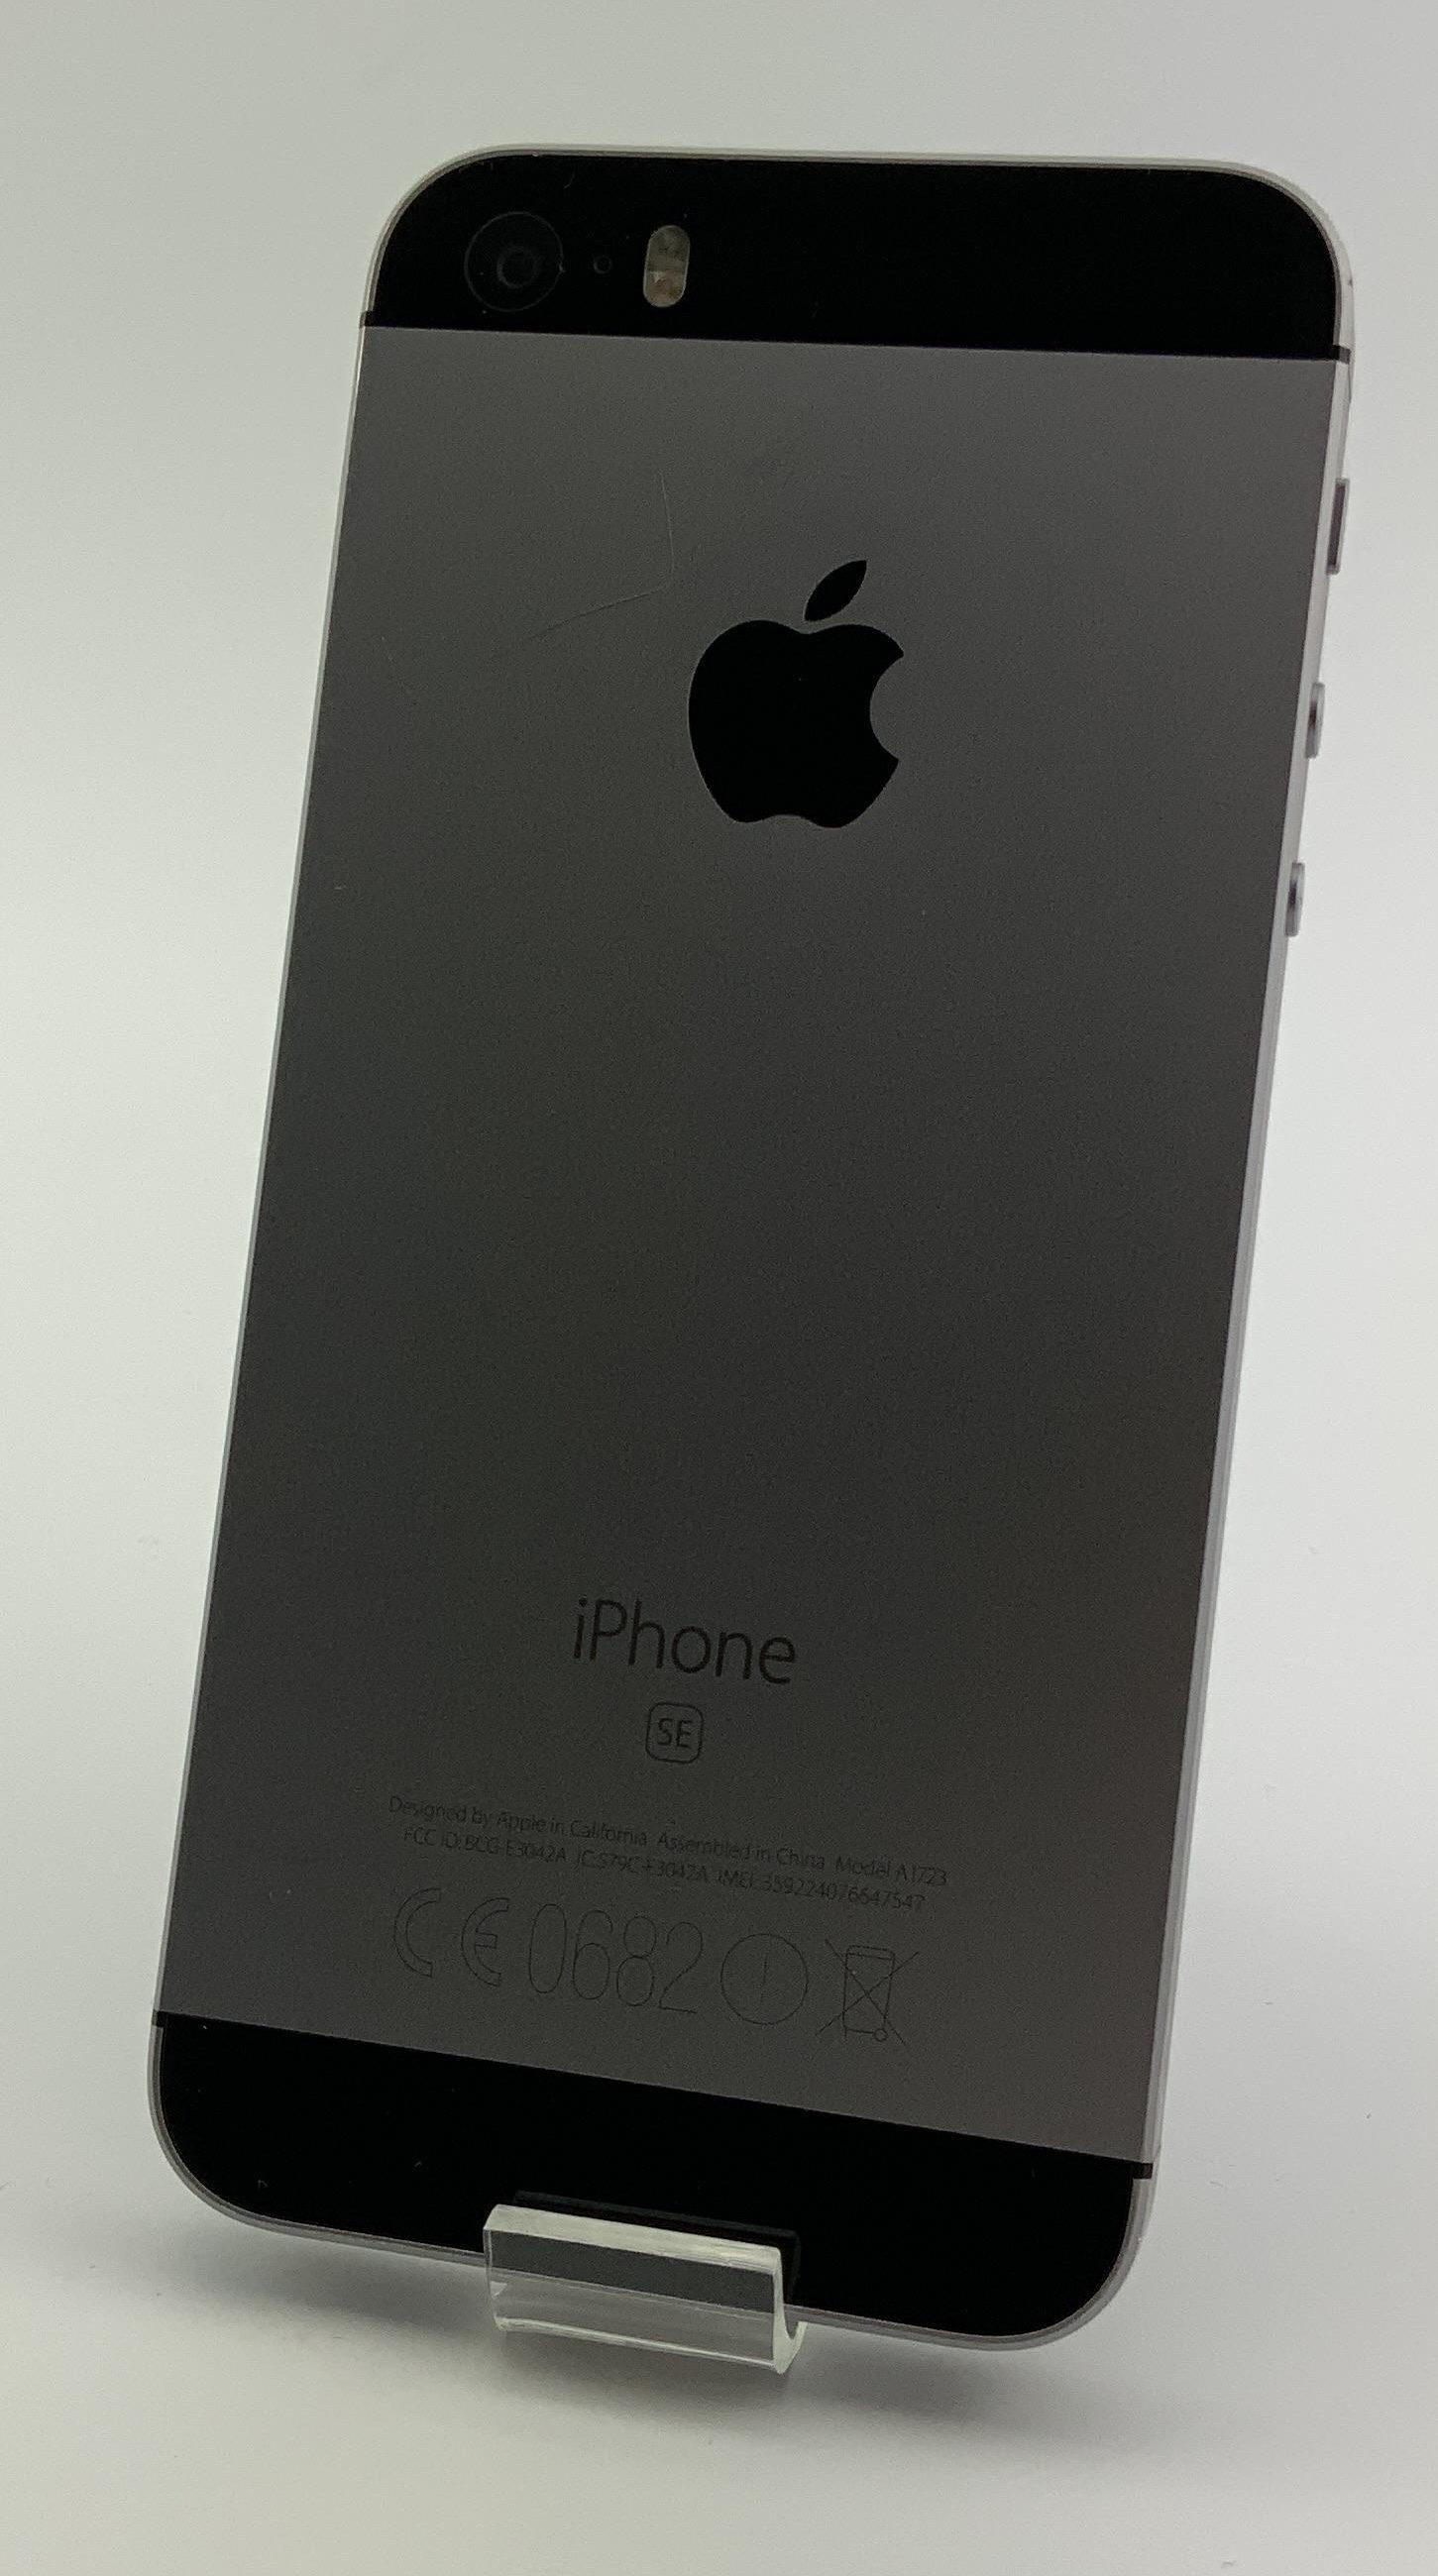 iPhone SE 16GB, 16GB, Space Gray, Kuva 2